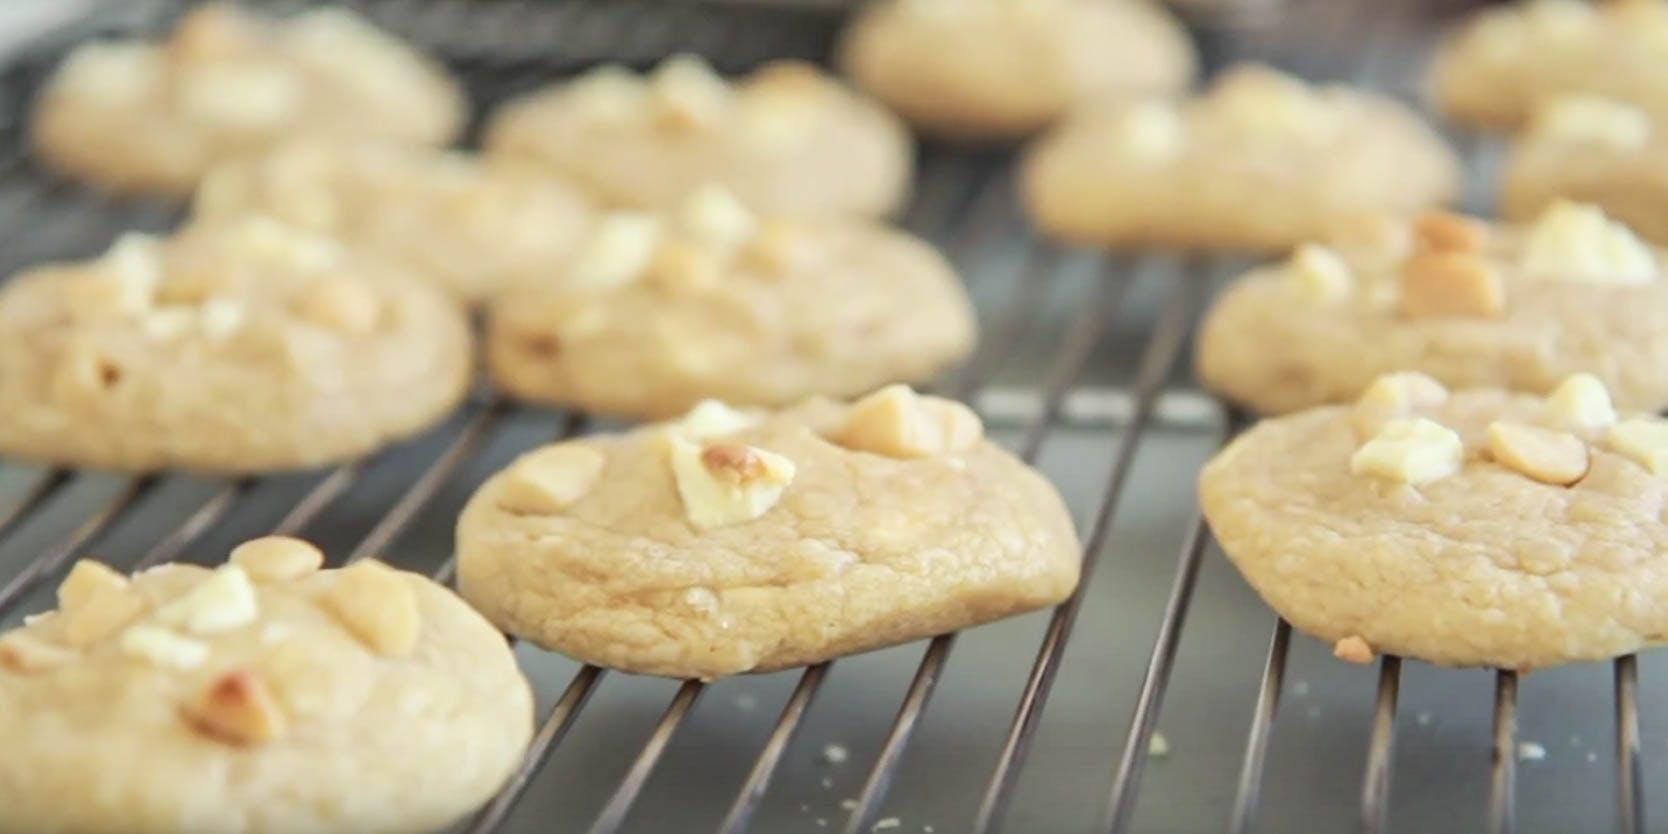 How to Make Cannabis-Infused White Chocolate Macadamia Cookies